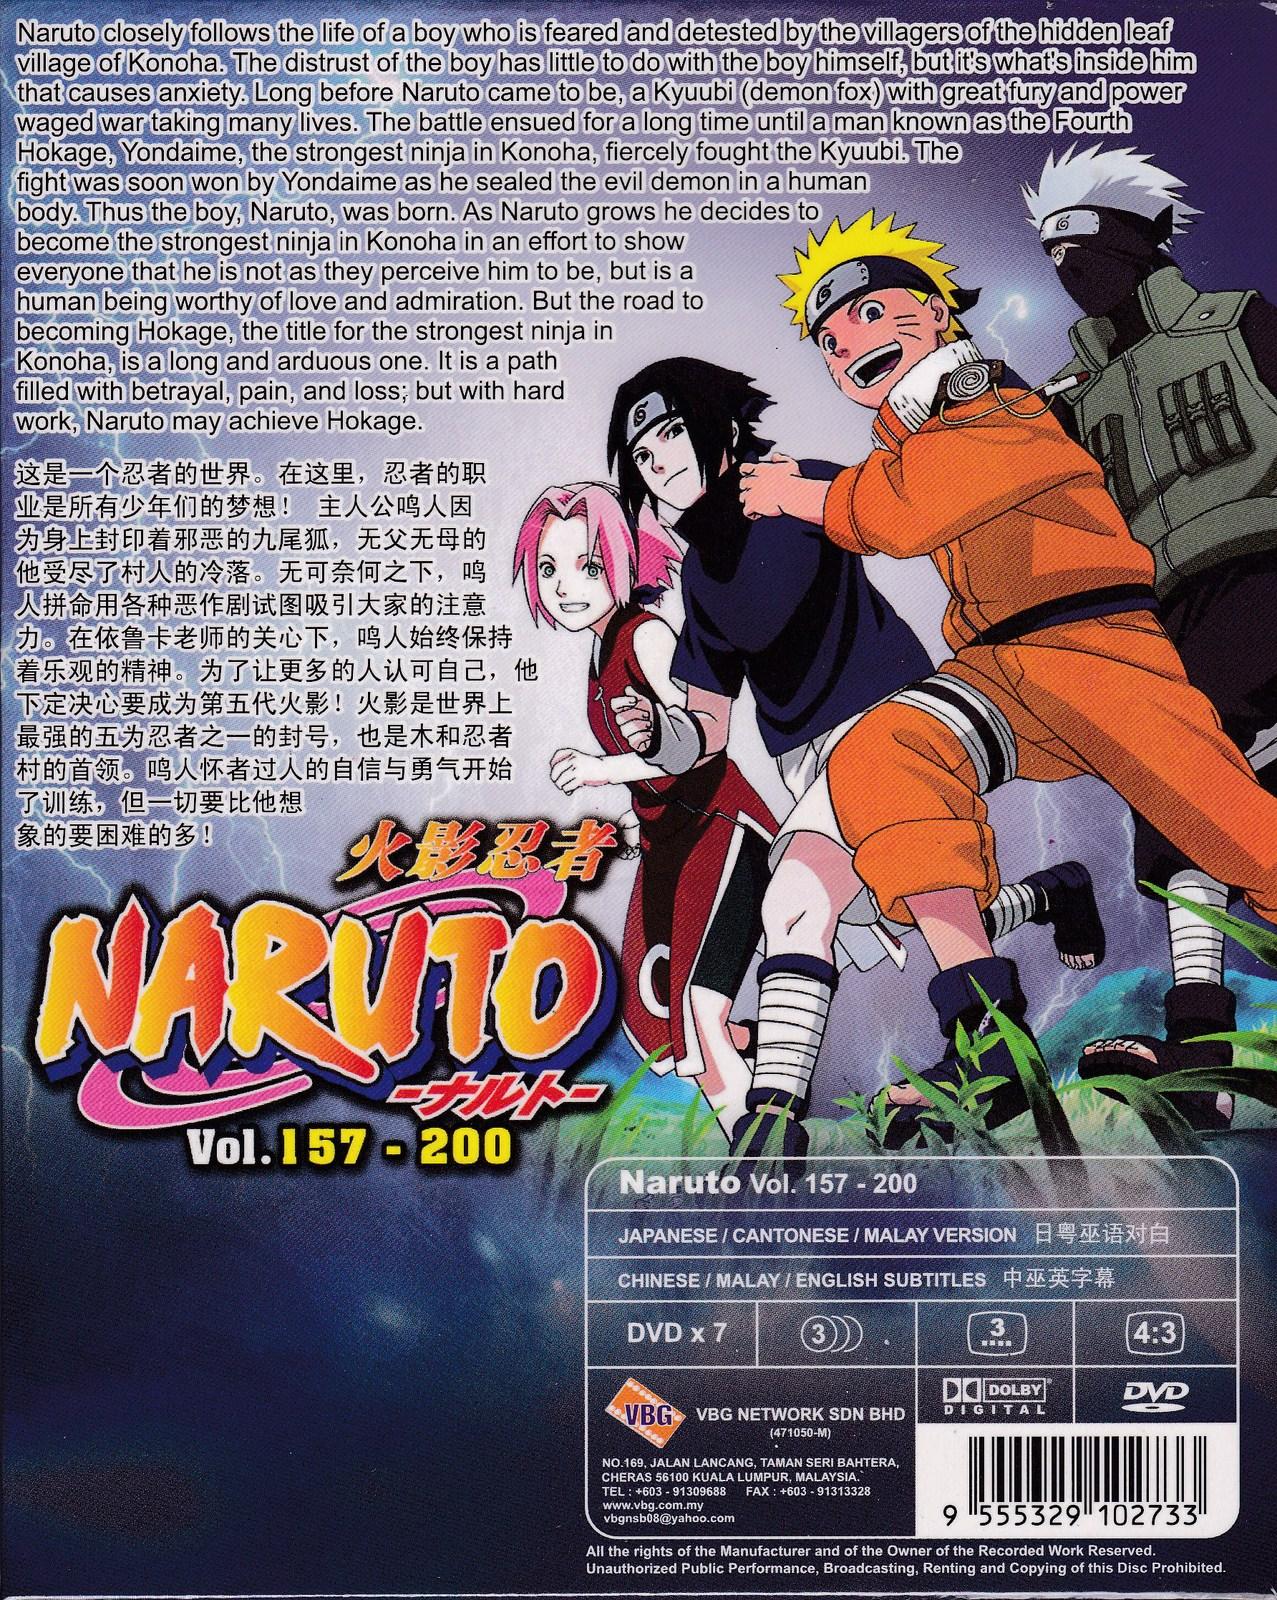 DVD ANIME NARUTO Season 4-5 Vol.157-200 Box Set 44 Episode